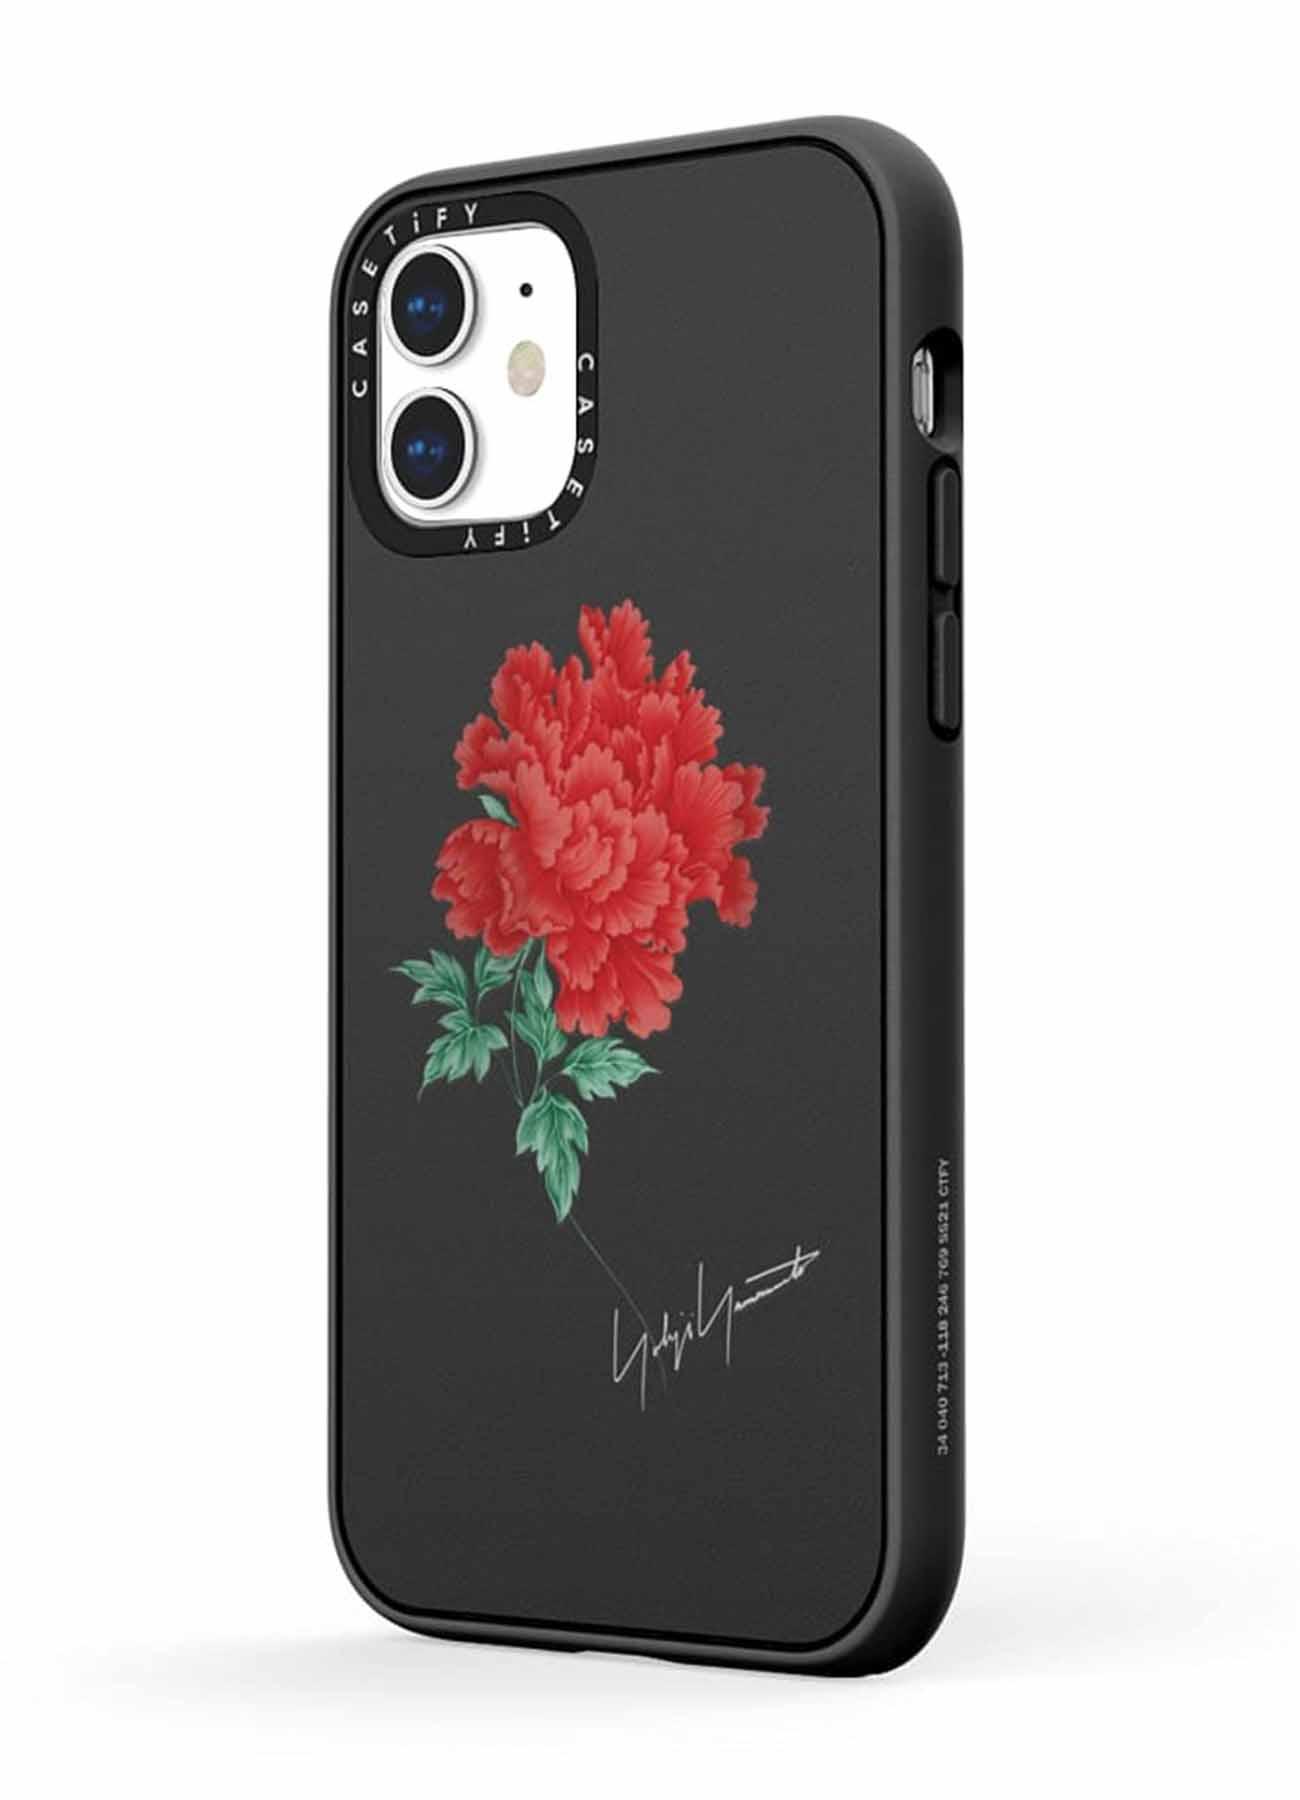 Yohji Yamamoto × CASETiFY One Flower iPhone Impact Case